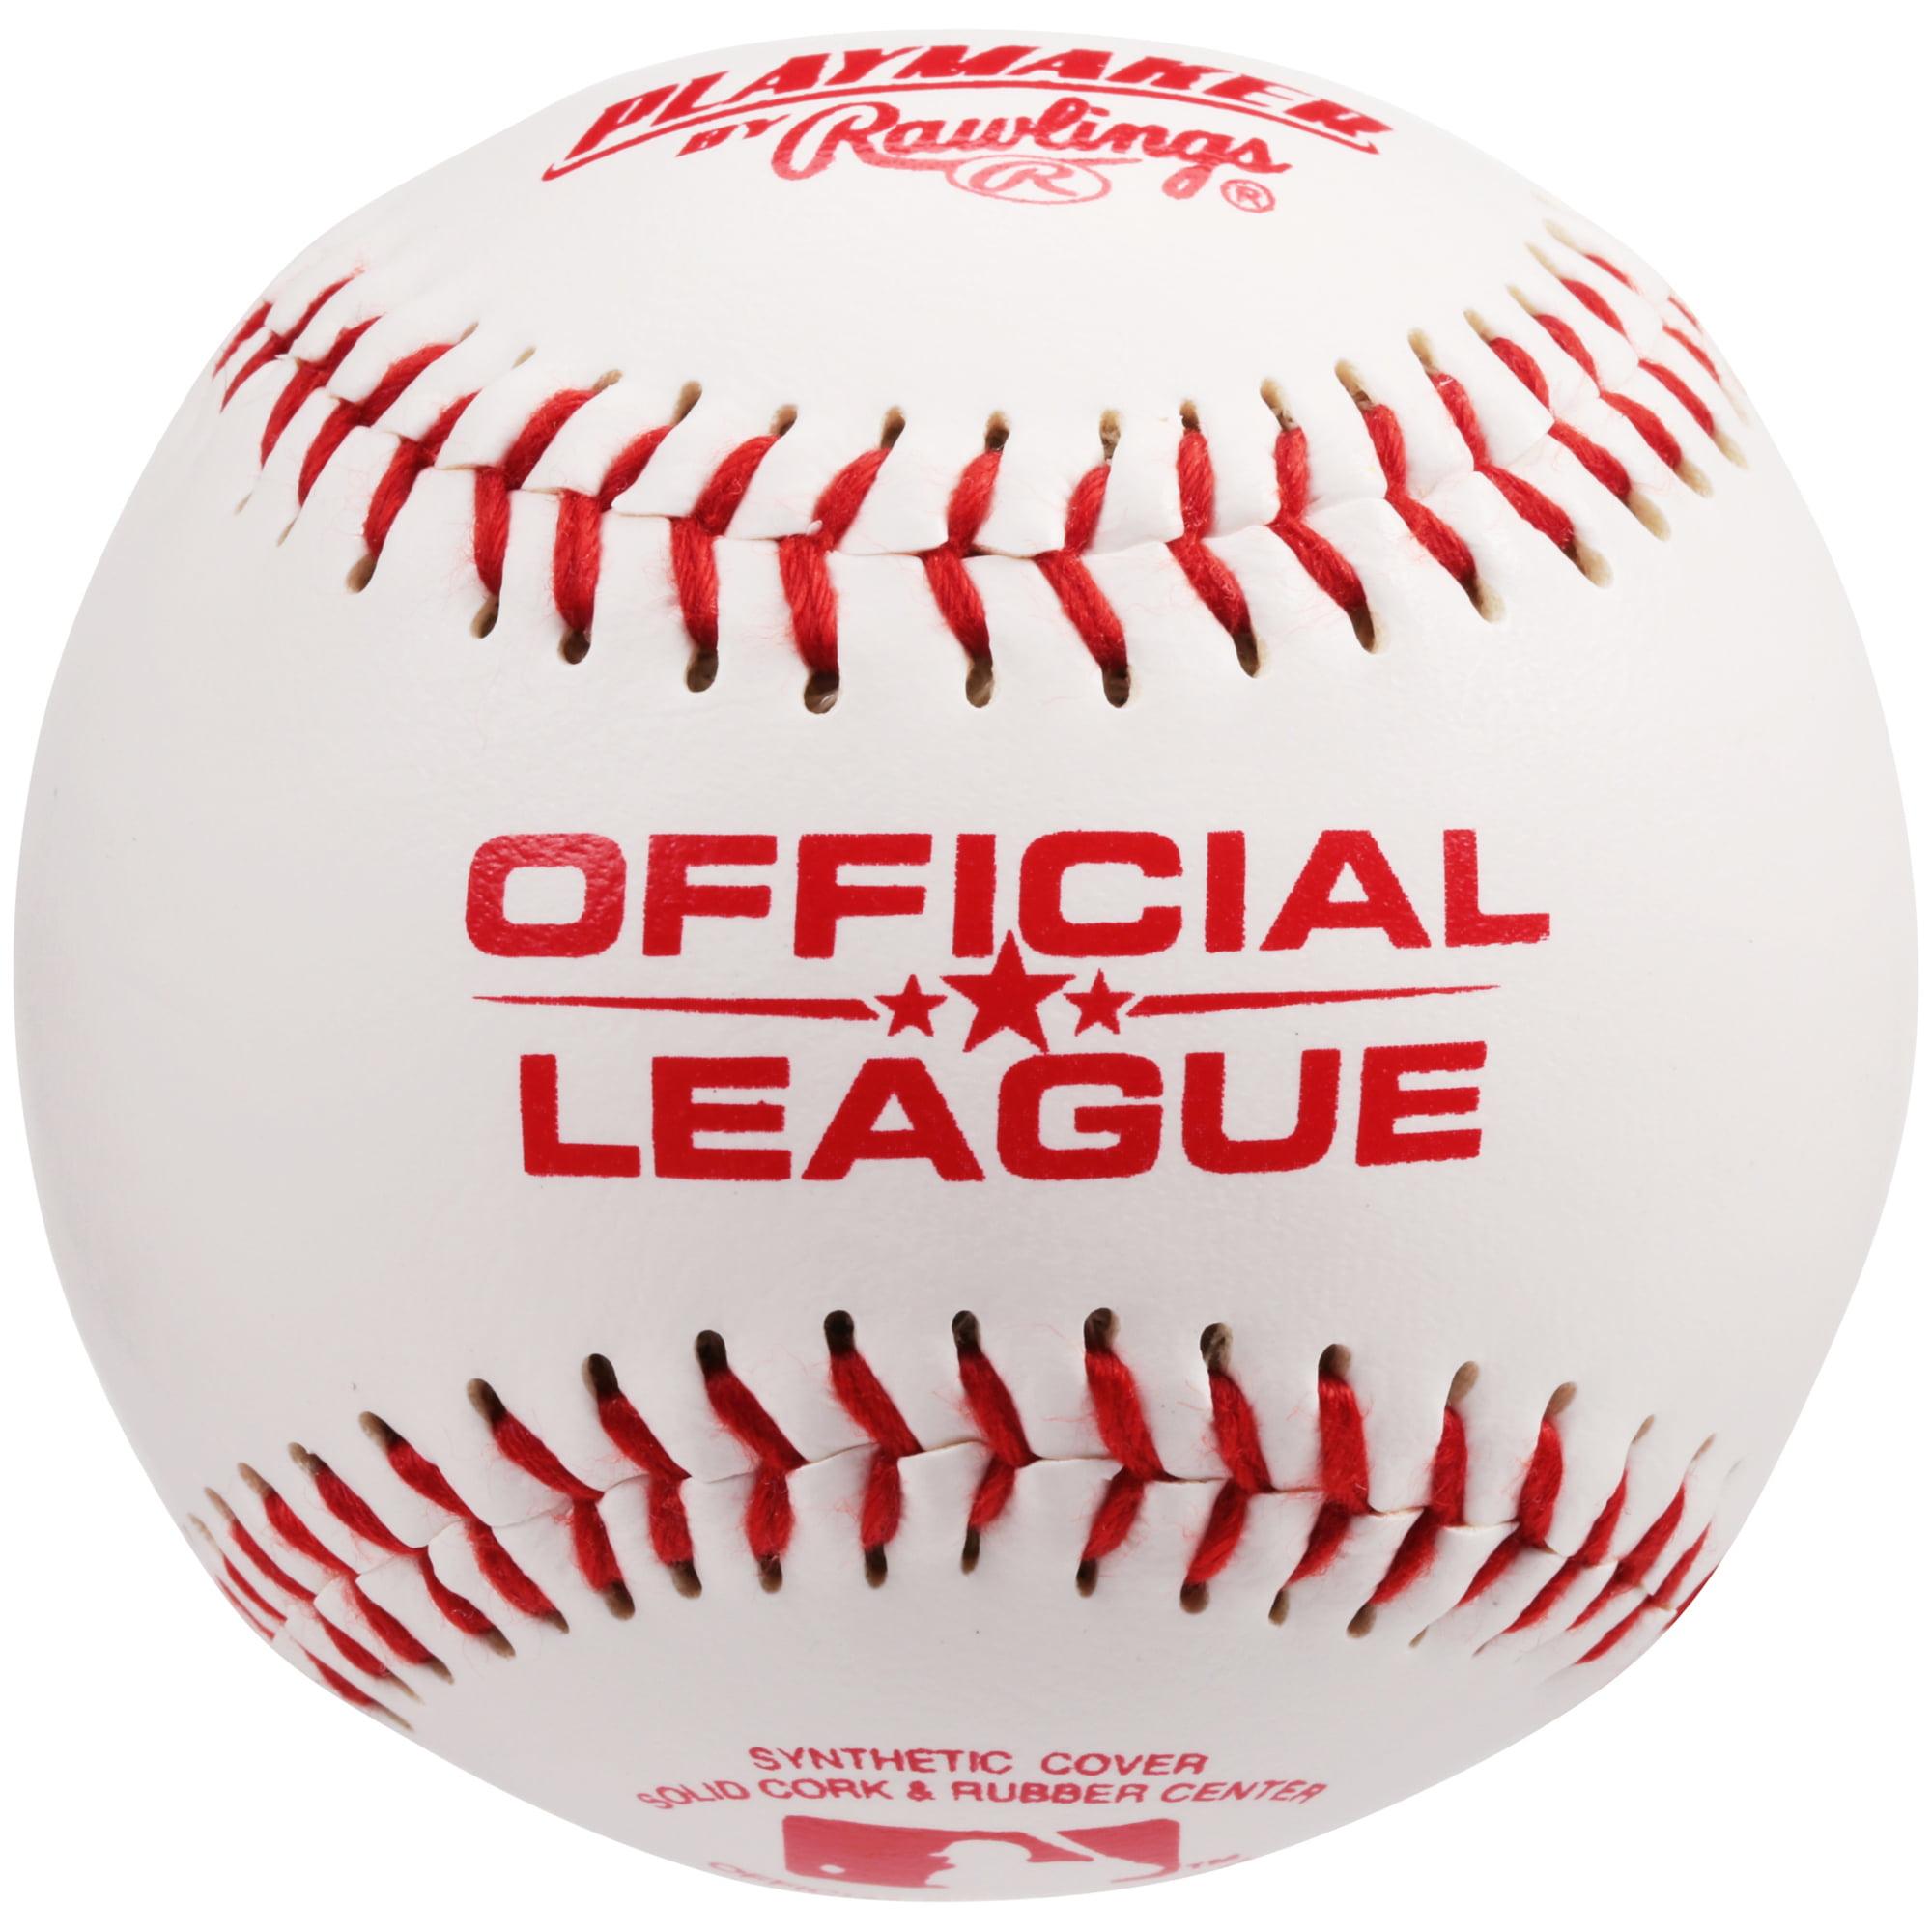 Rawlings® Playmaker Official League Baseball - Walmart.com